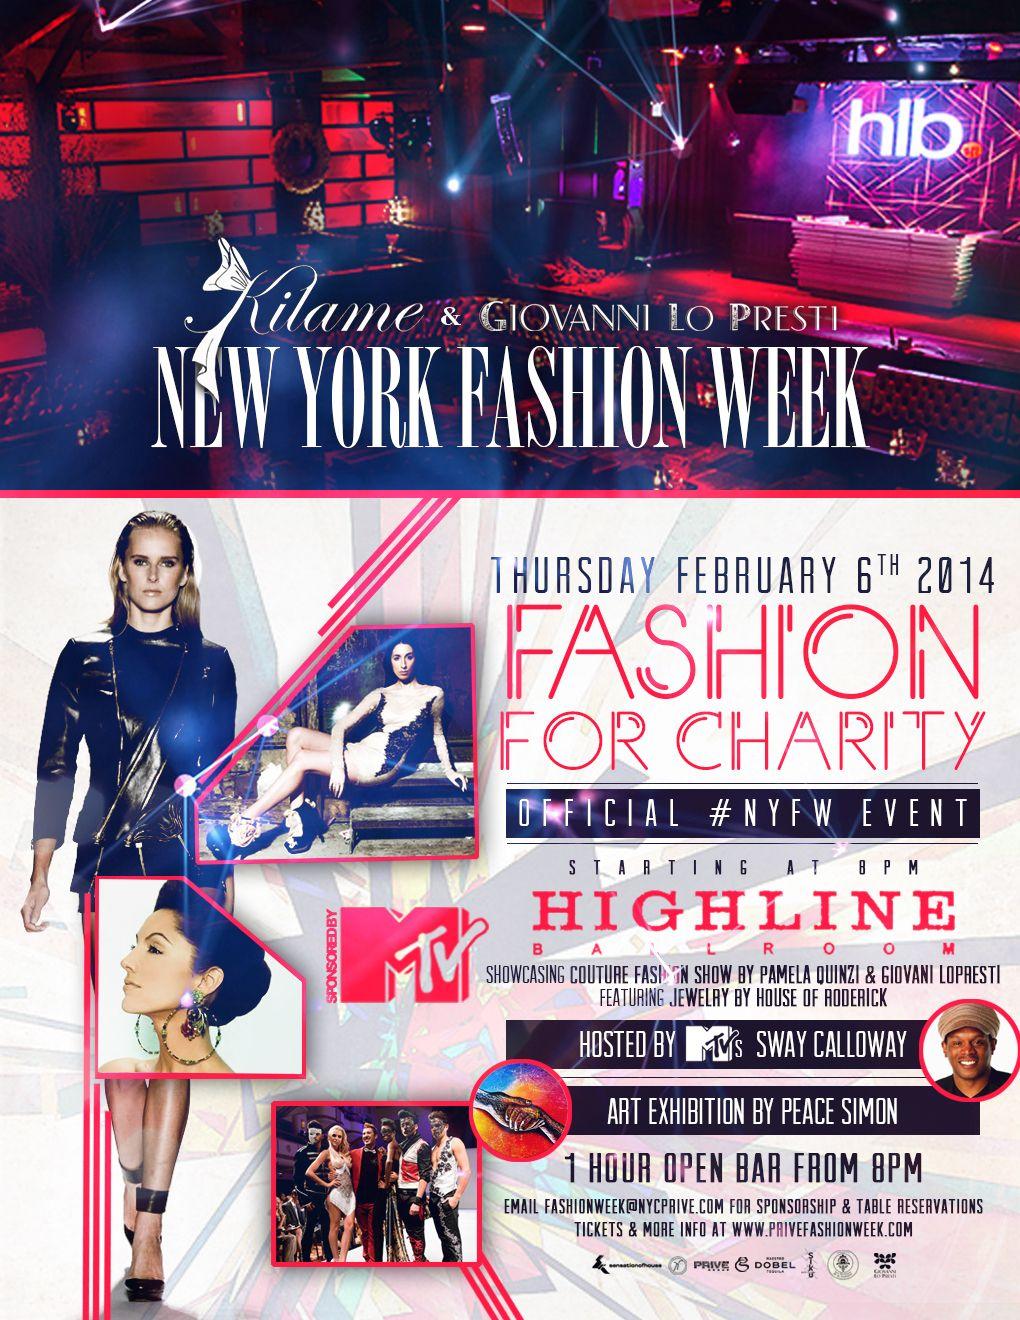 New York Fashion Week 2014 Flyer Sway Calloway Night Life